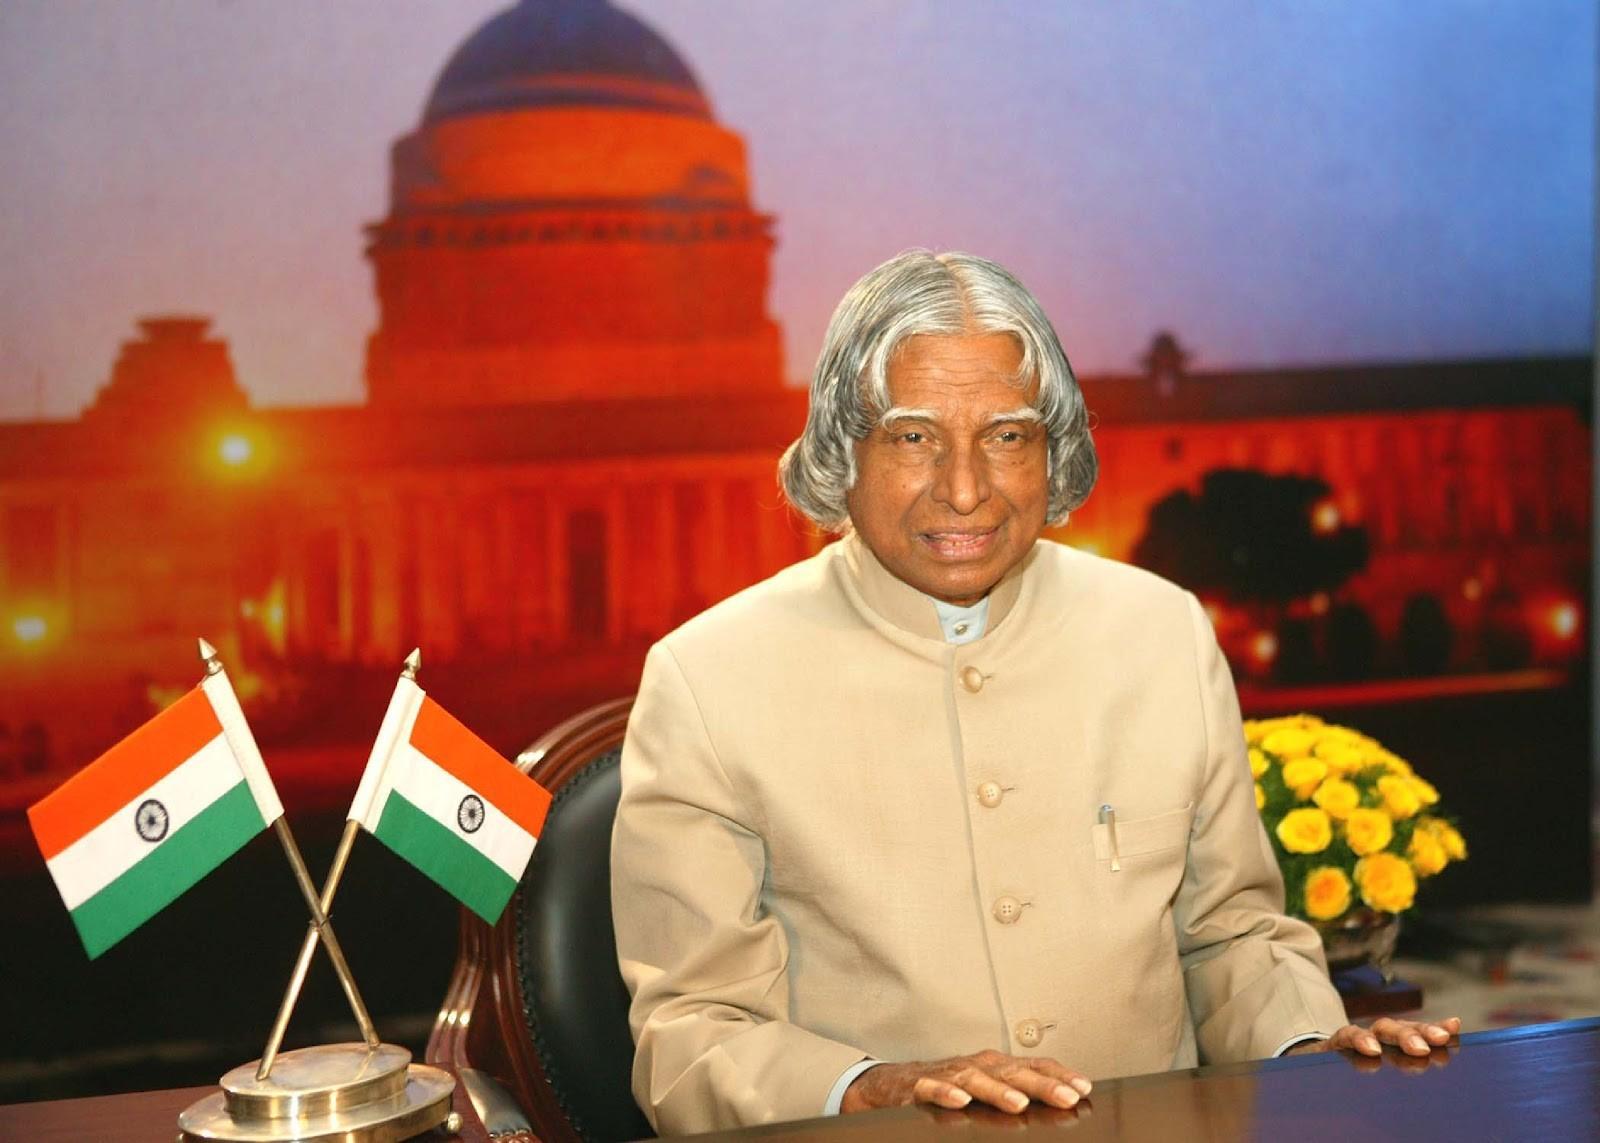 AICF salutes APJ Abdul Kalam, Former President of India